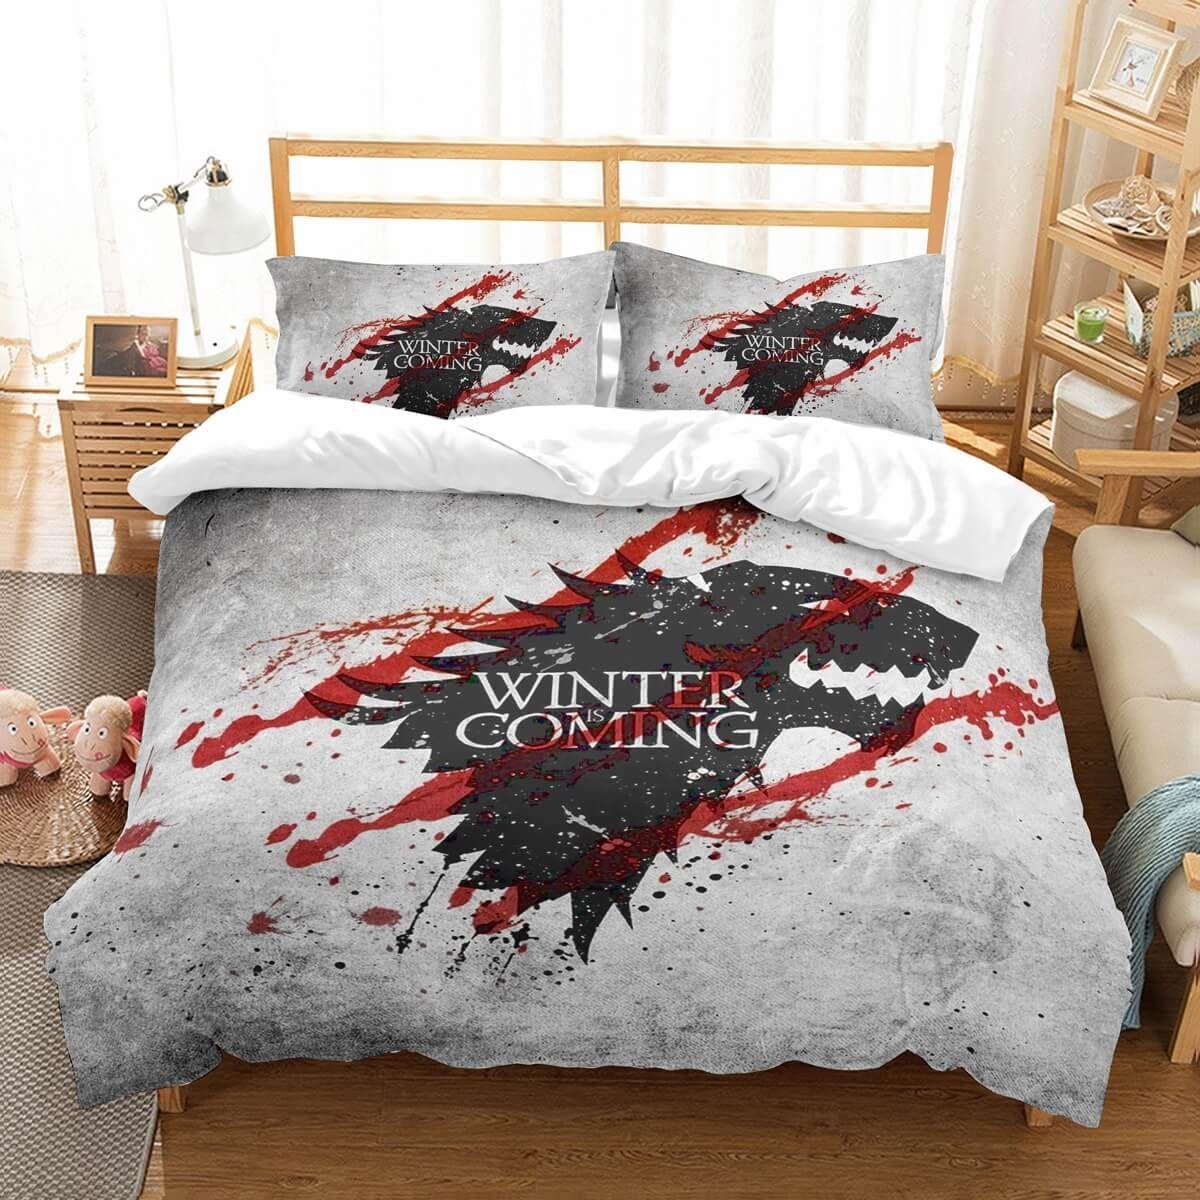 3D Customize Game Of Thrones Bedding Set Duvet Cover Set Bedroom